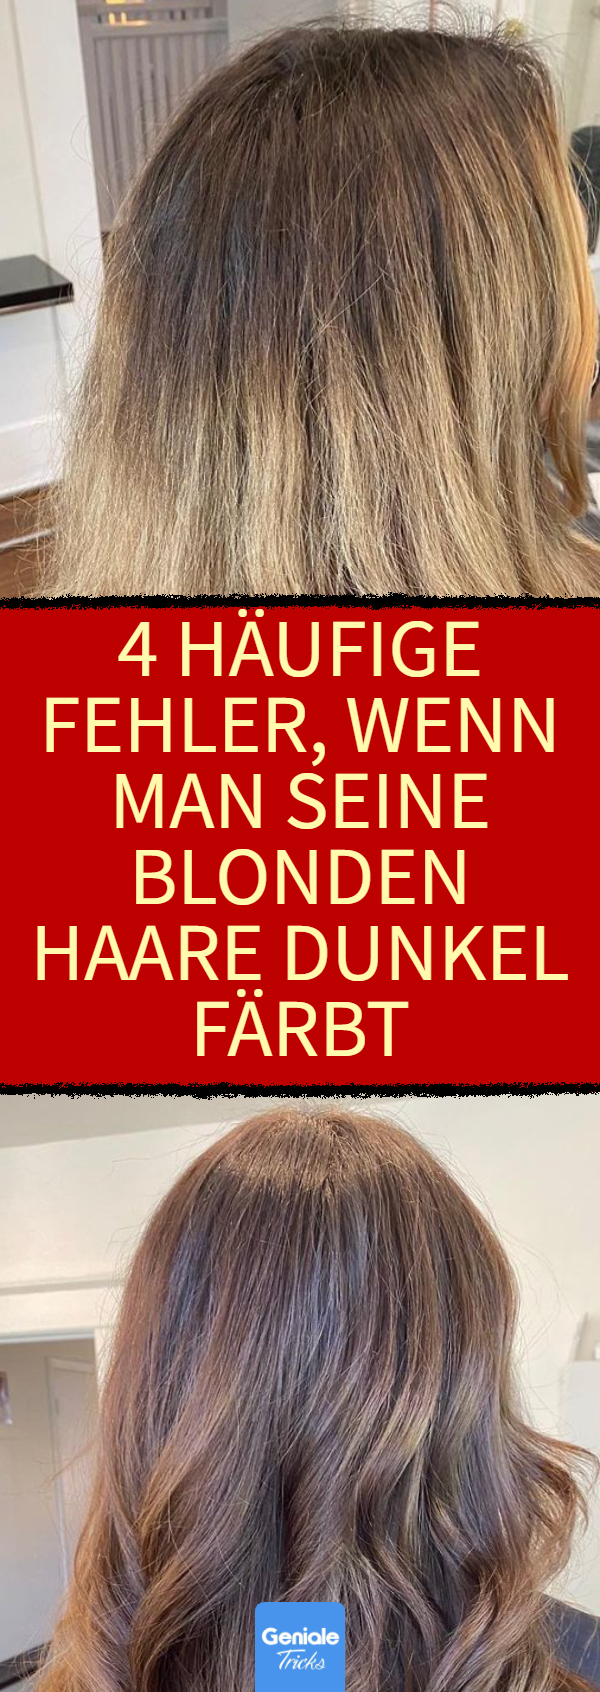 Dunkler blond gefärbte färben haare banknatisi: Haare